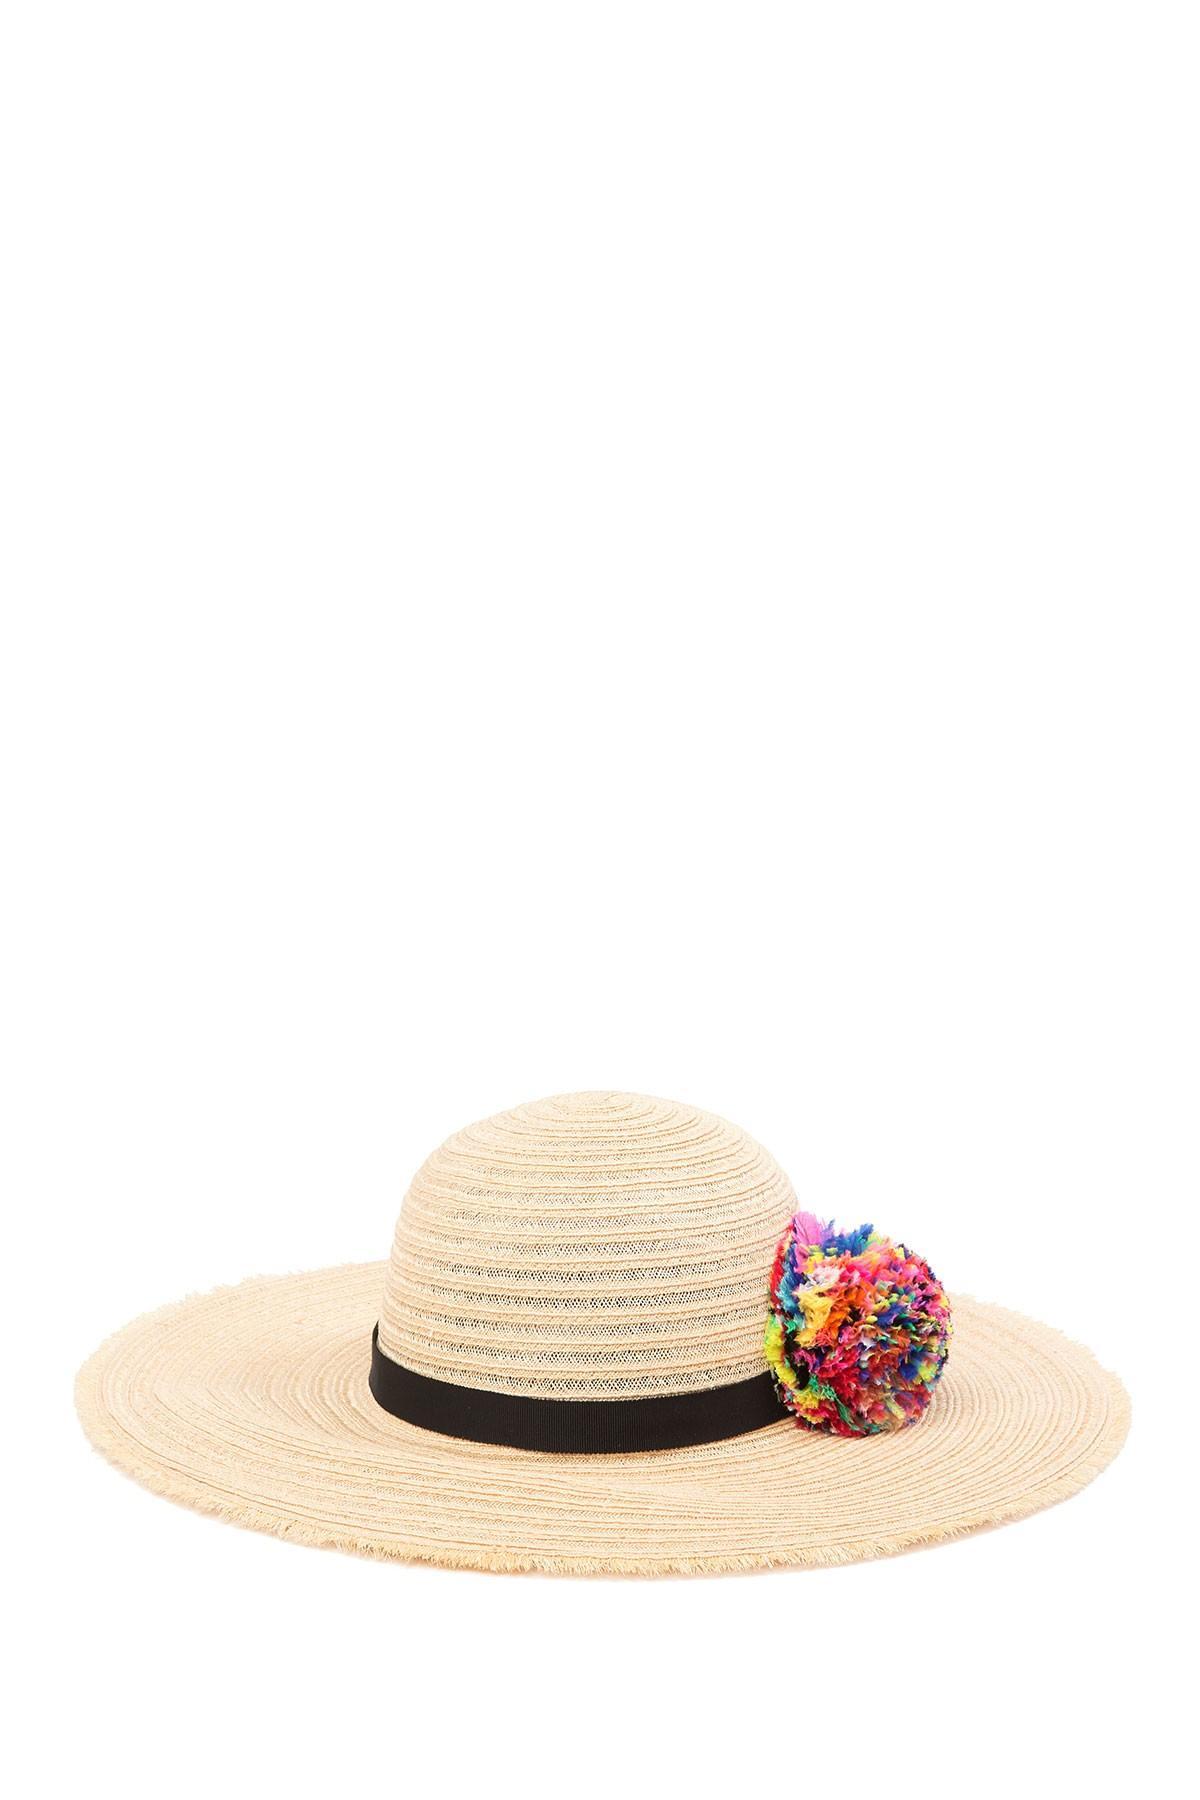 c407f3d4 Lyst - Eugenia Kim Honey Multi Pom Floppy Hat in Natural